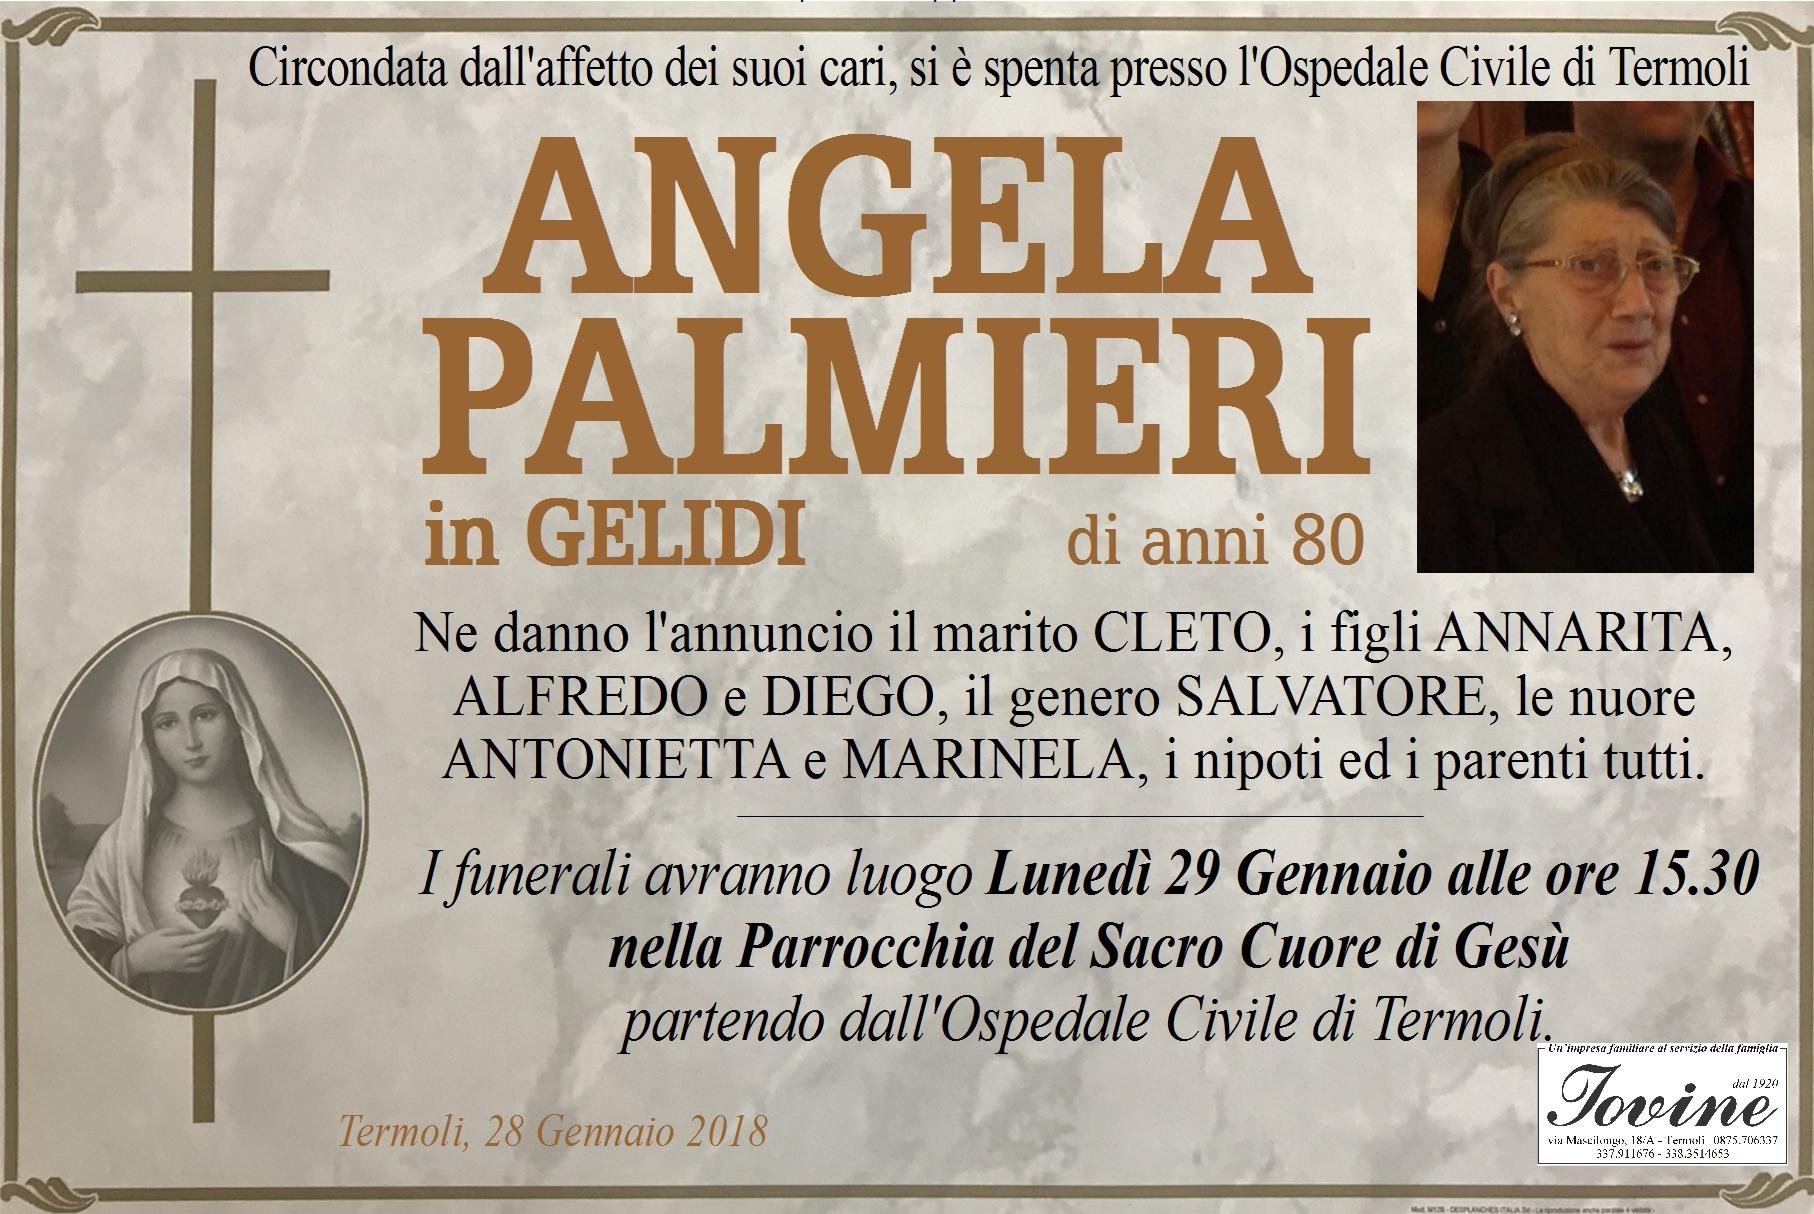 Angela Palmieri, 28/01/2018, Termoli – Onoranze Funebri Iovine